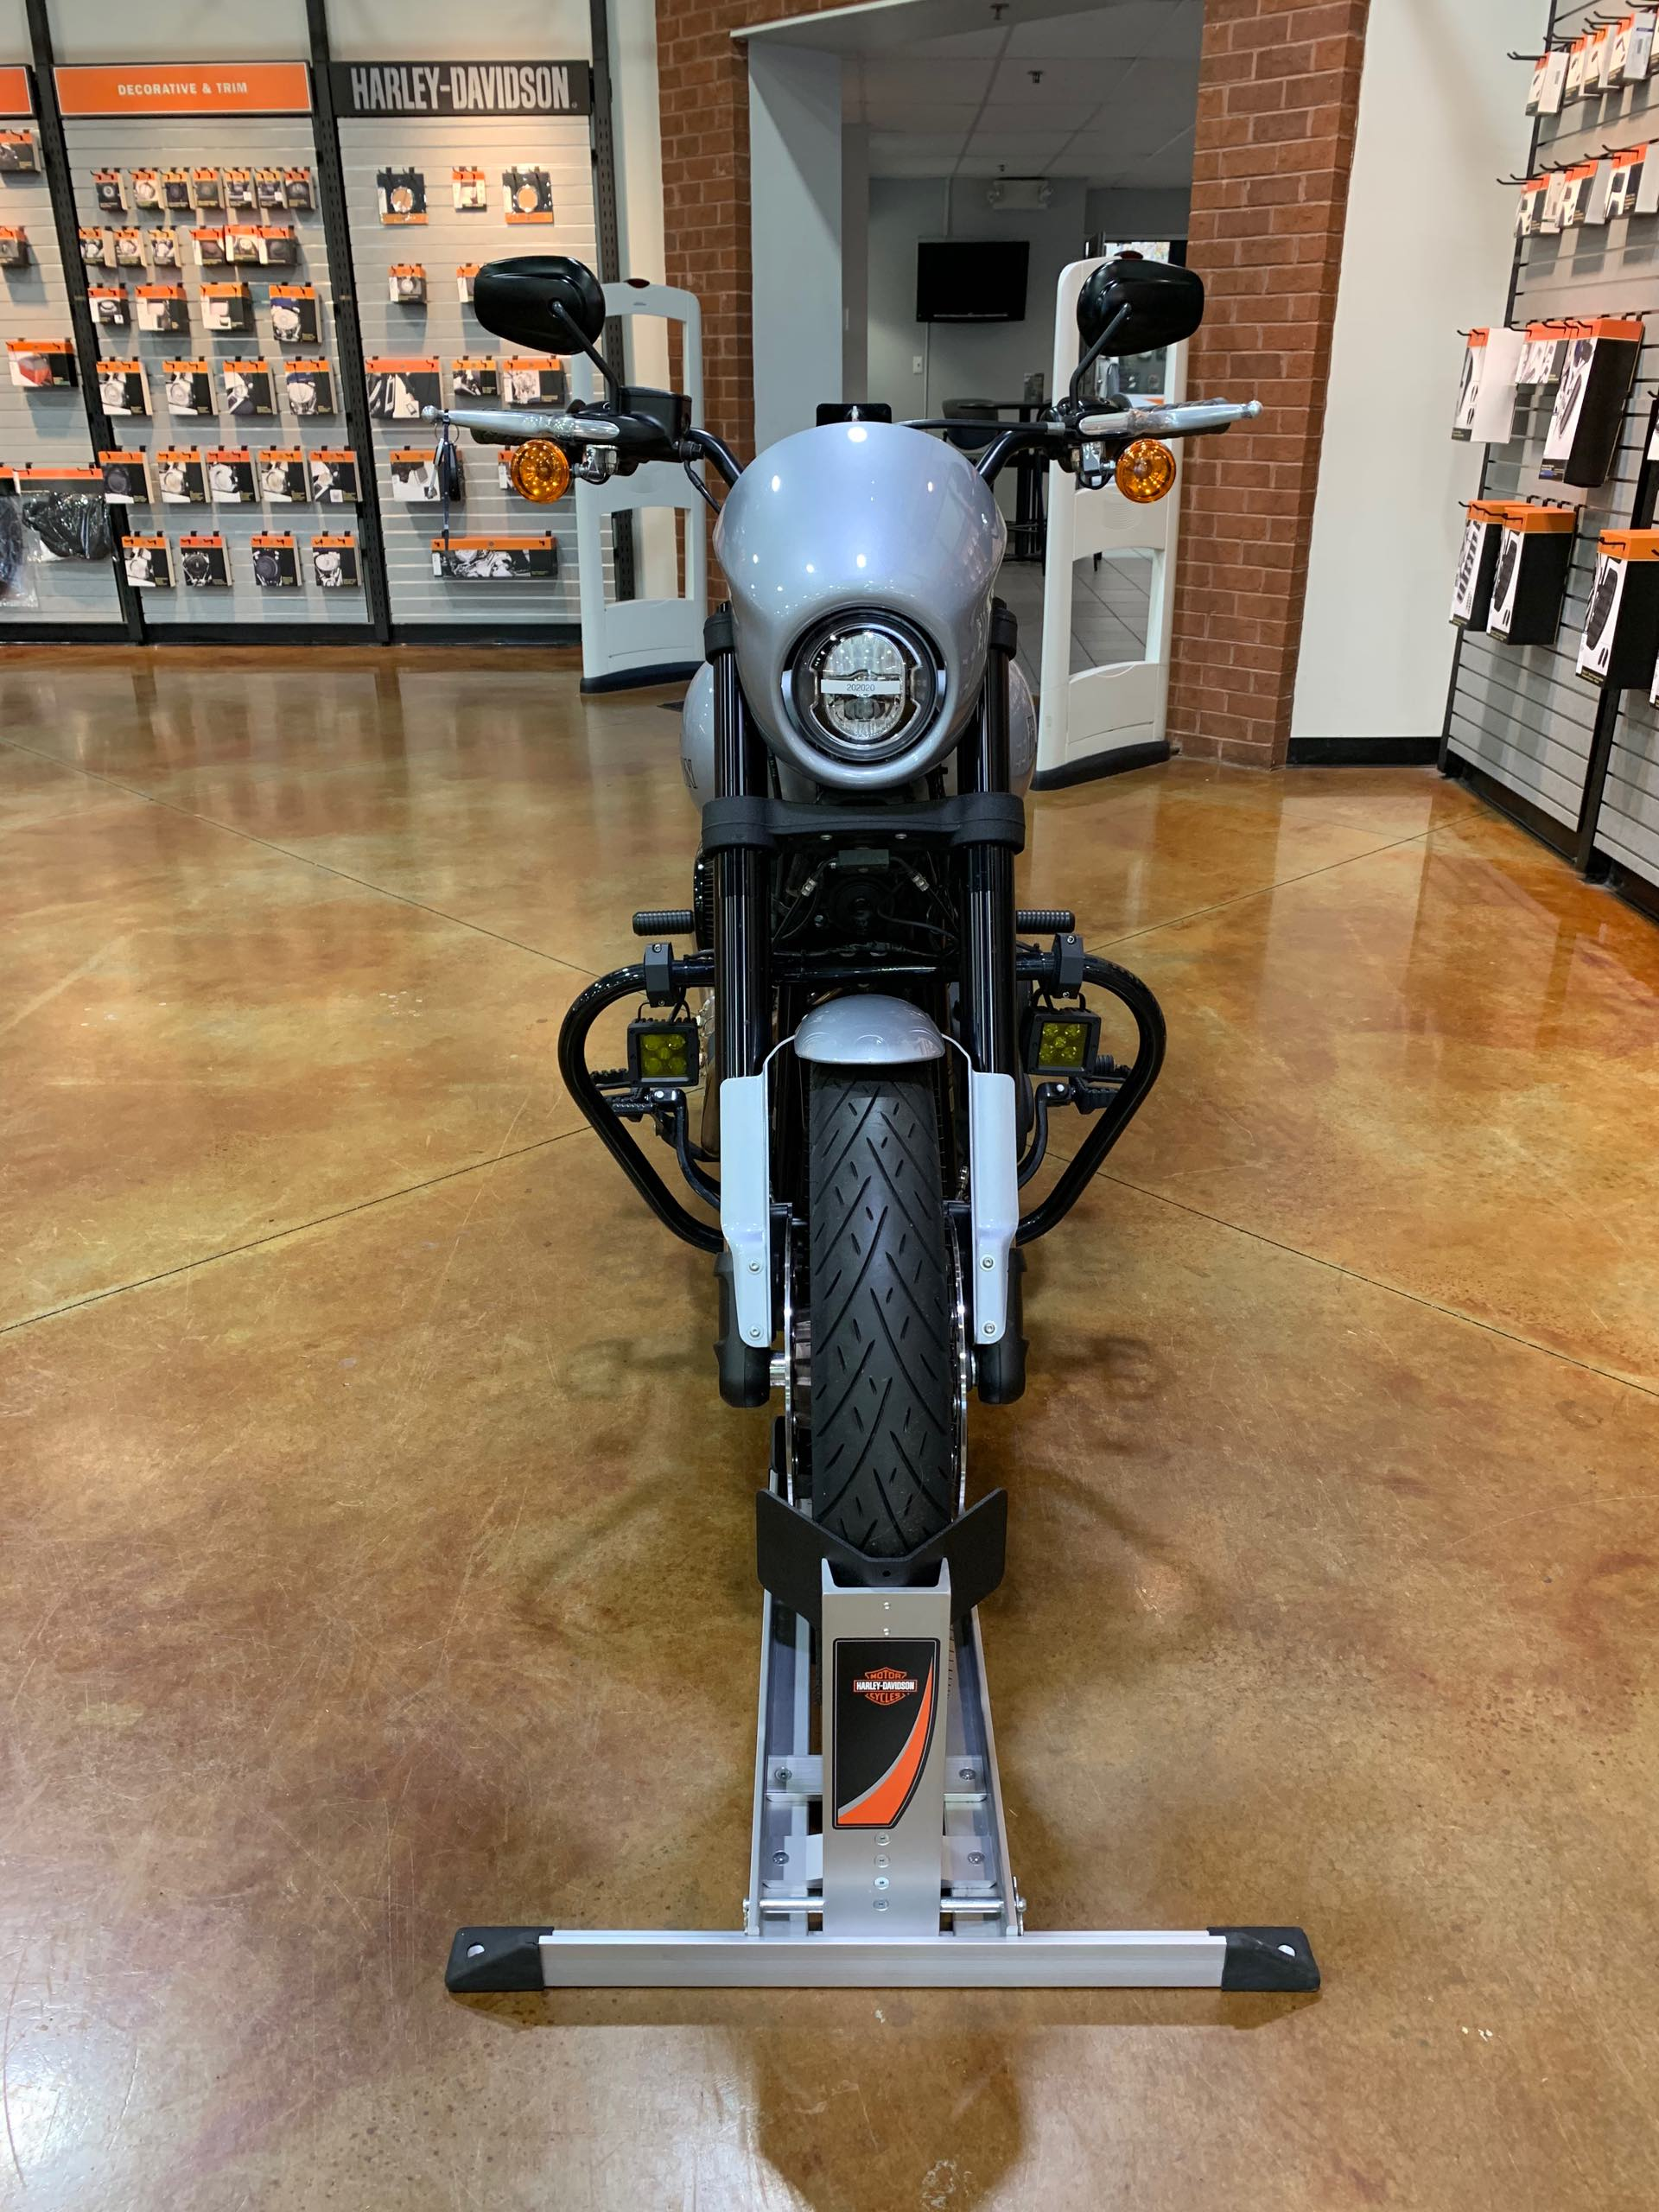 2020 Harley-Davidson Softail Low Rider S at Colonial Harley-Davidson